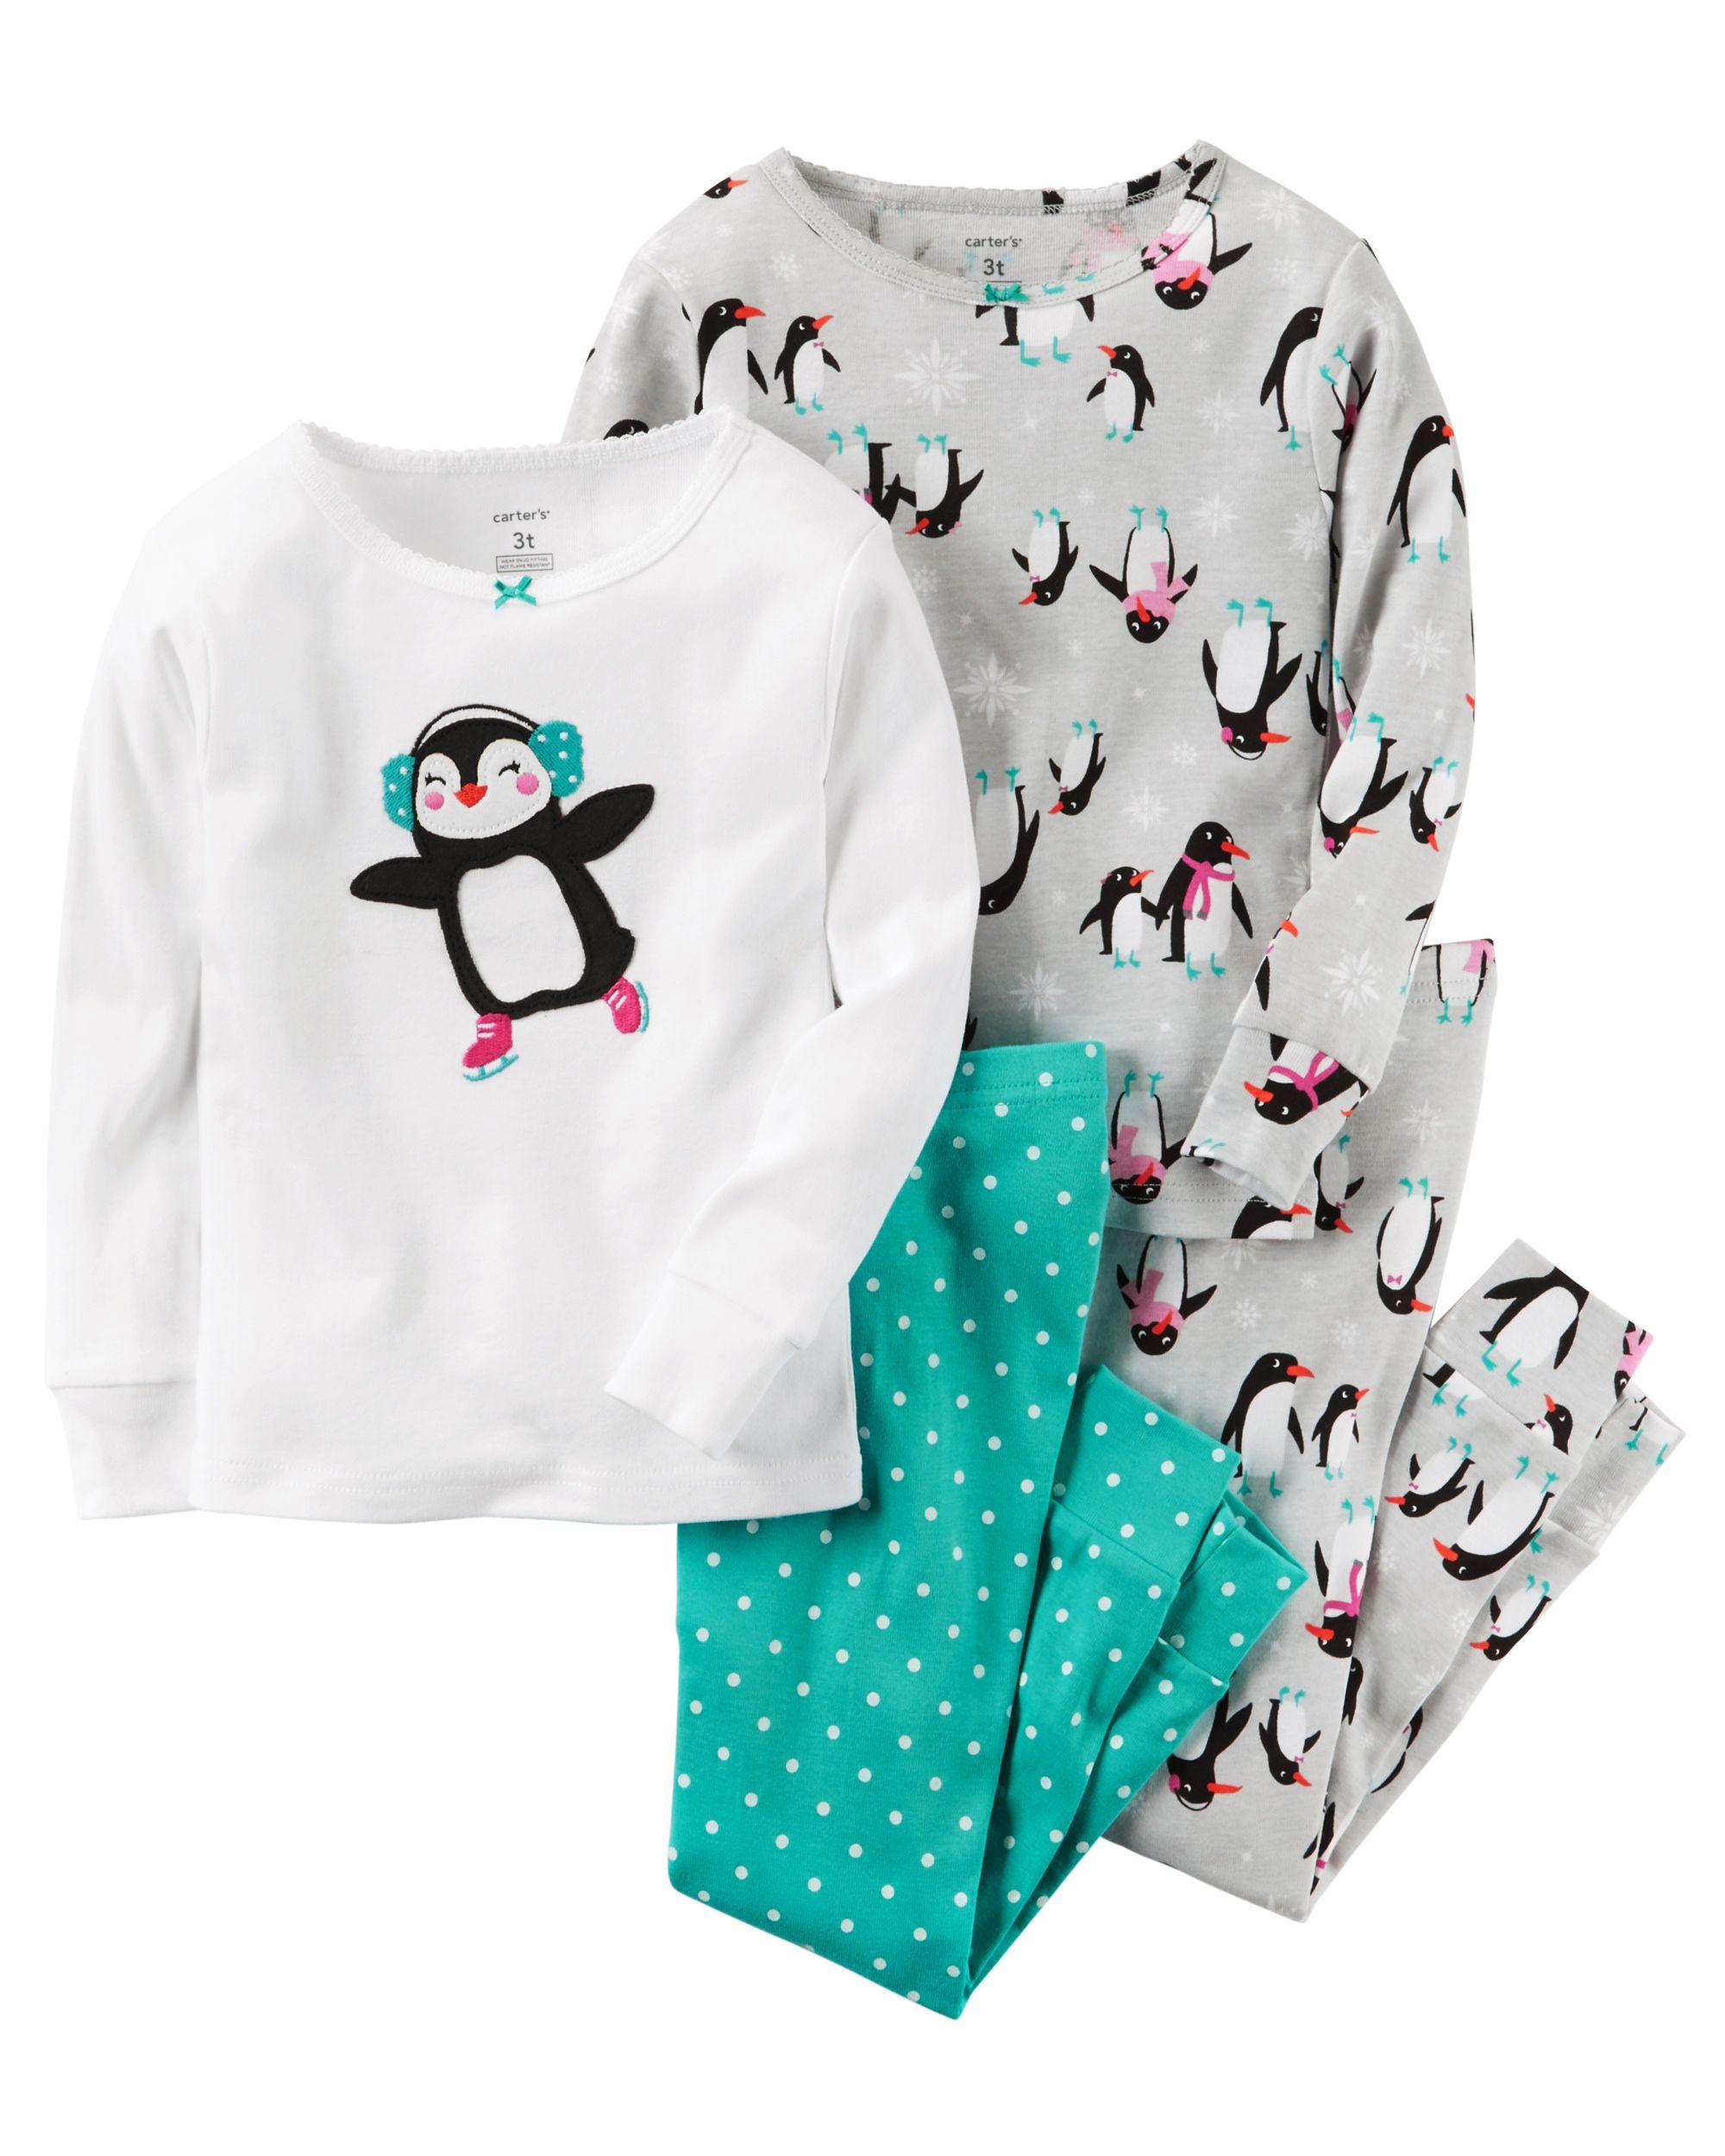 95f2247c49ae Toddler Girl 4-Piece Snug Fit Cotton PJs